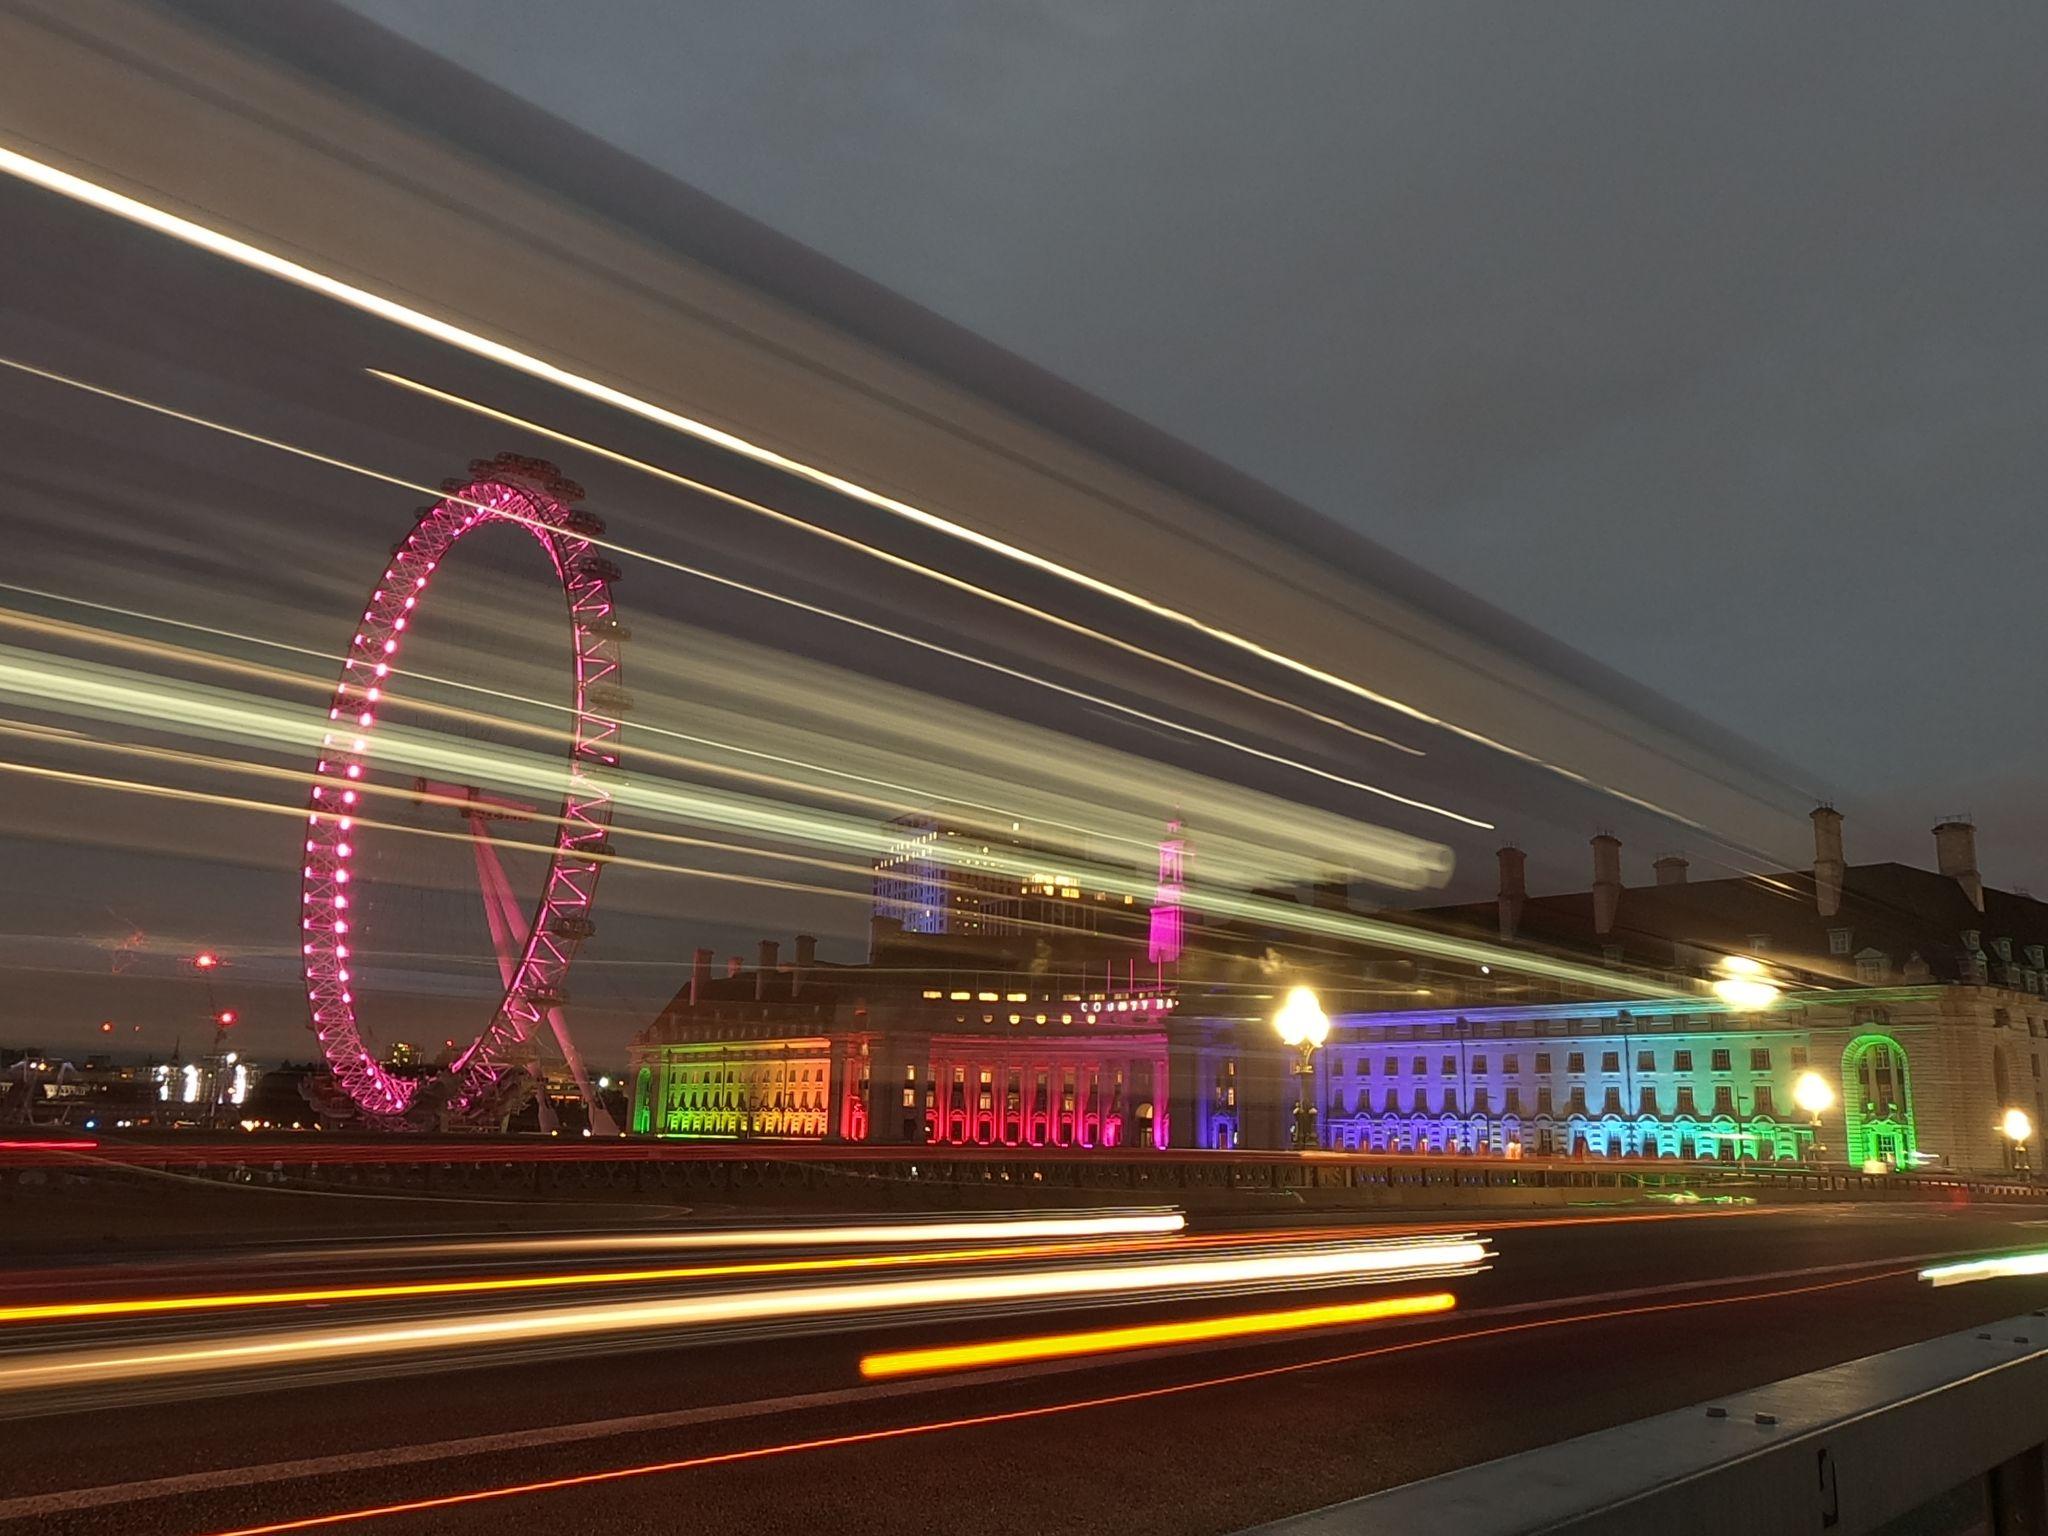 Pavement Westminster Bridge, United Kingdom